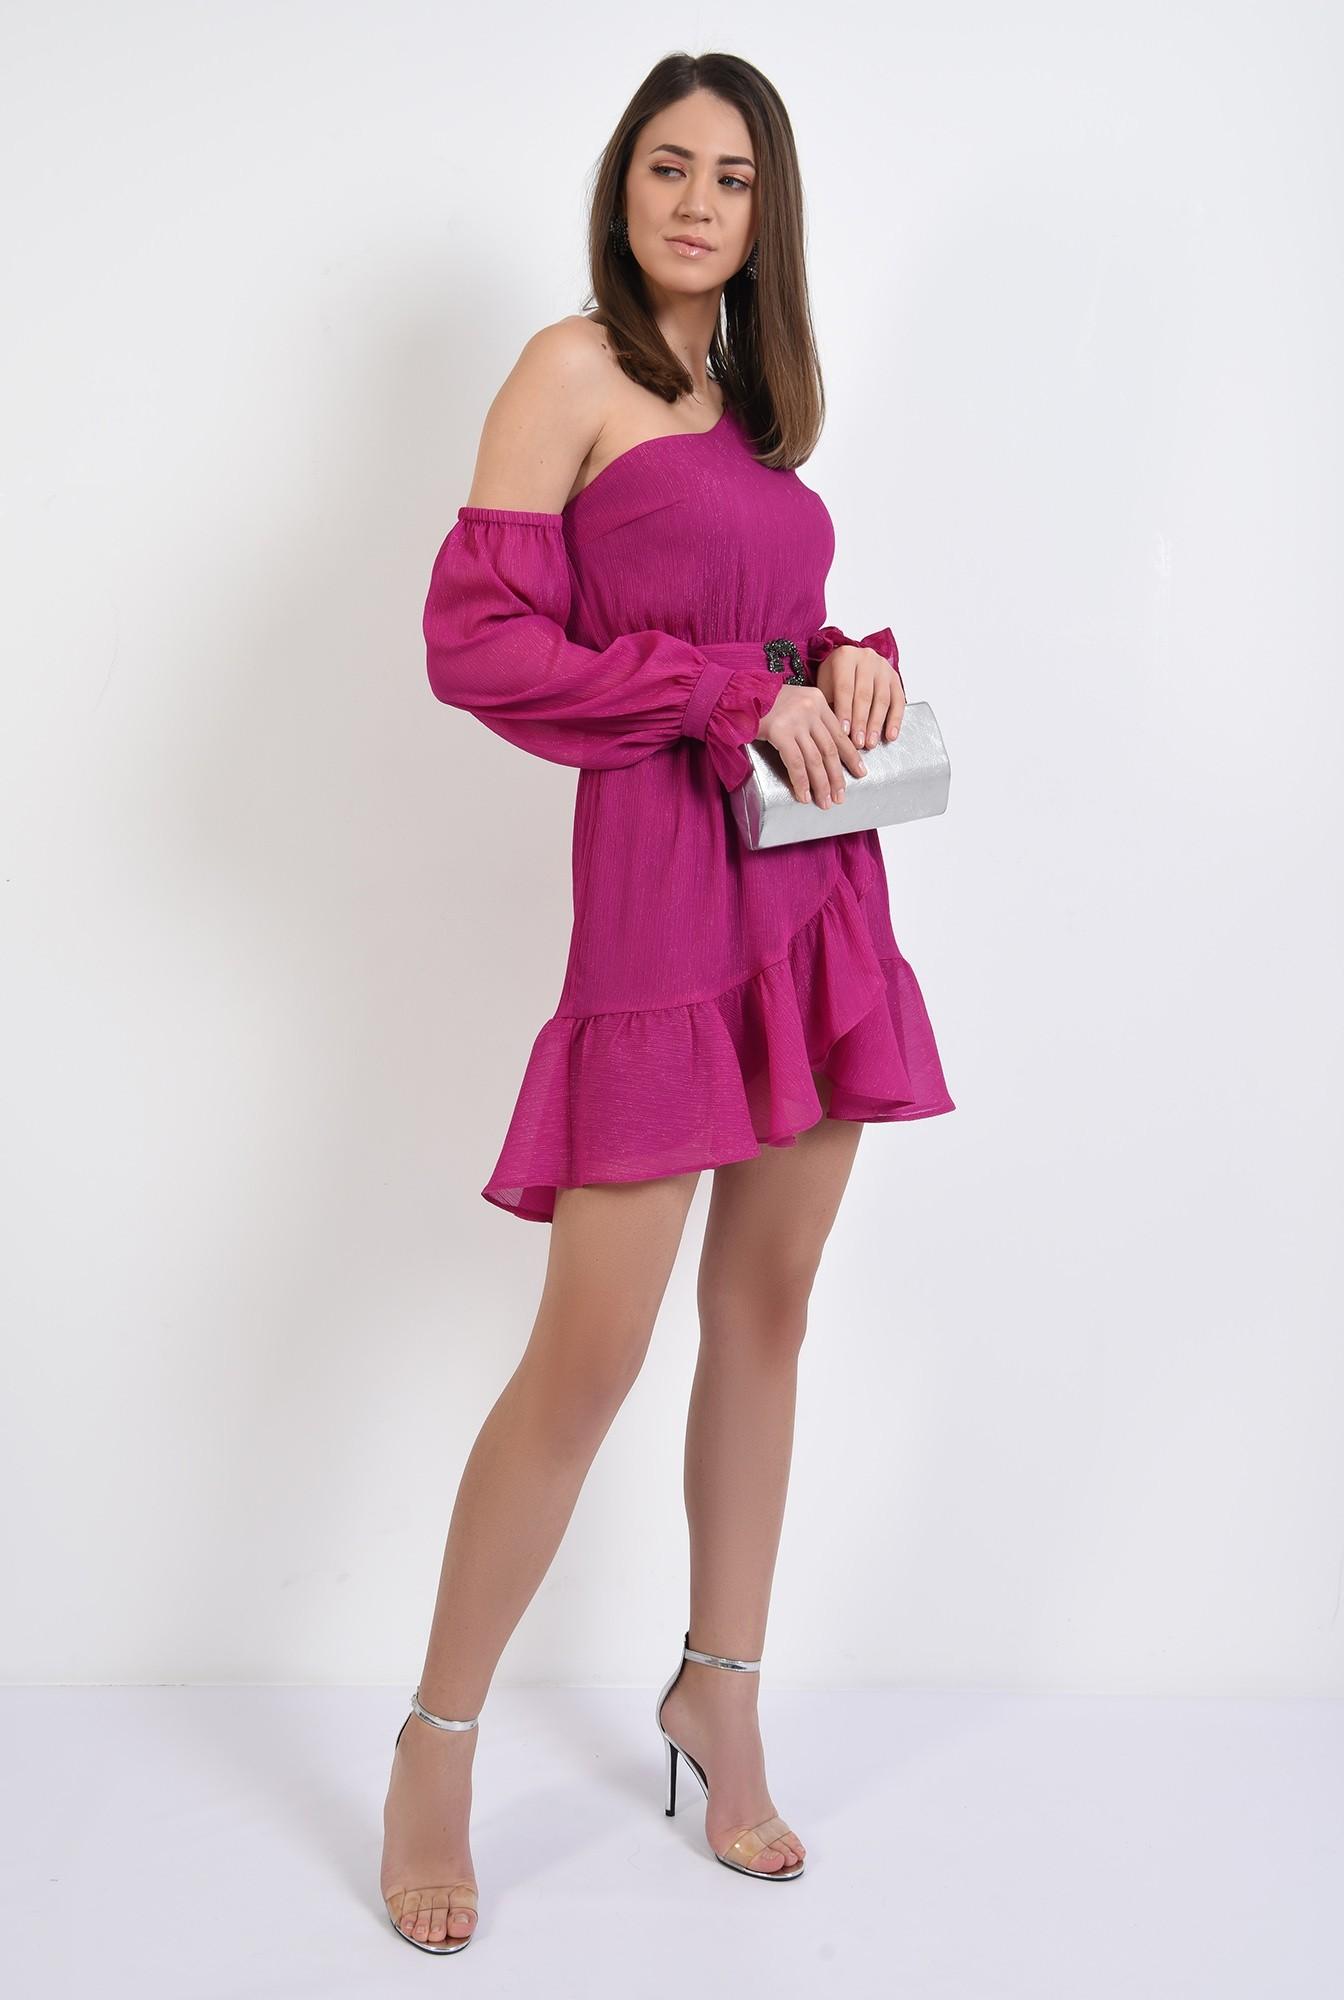 3 - 360 - rochie mini, evazata, decolteu asimetric, maneci bufante, rochie de seara